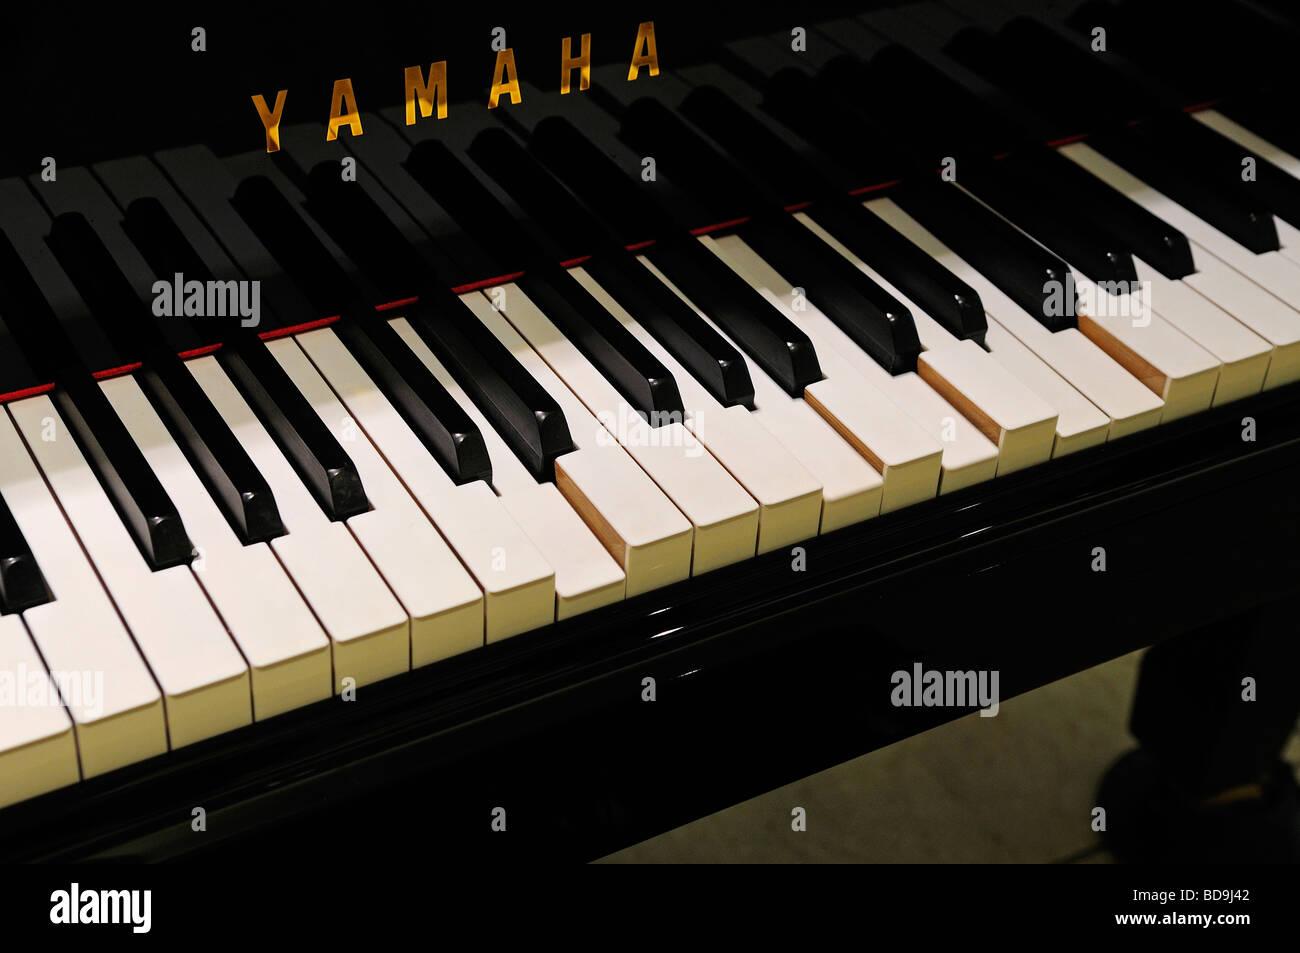 Yamaha pressed piano keyboard - Stock Image